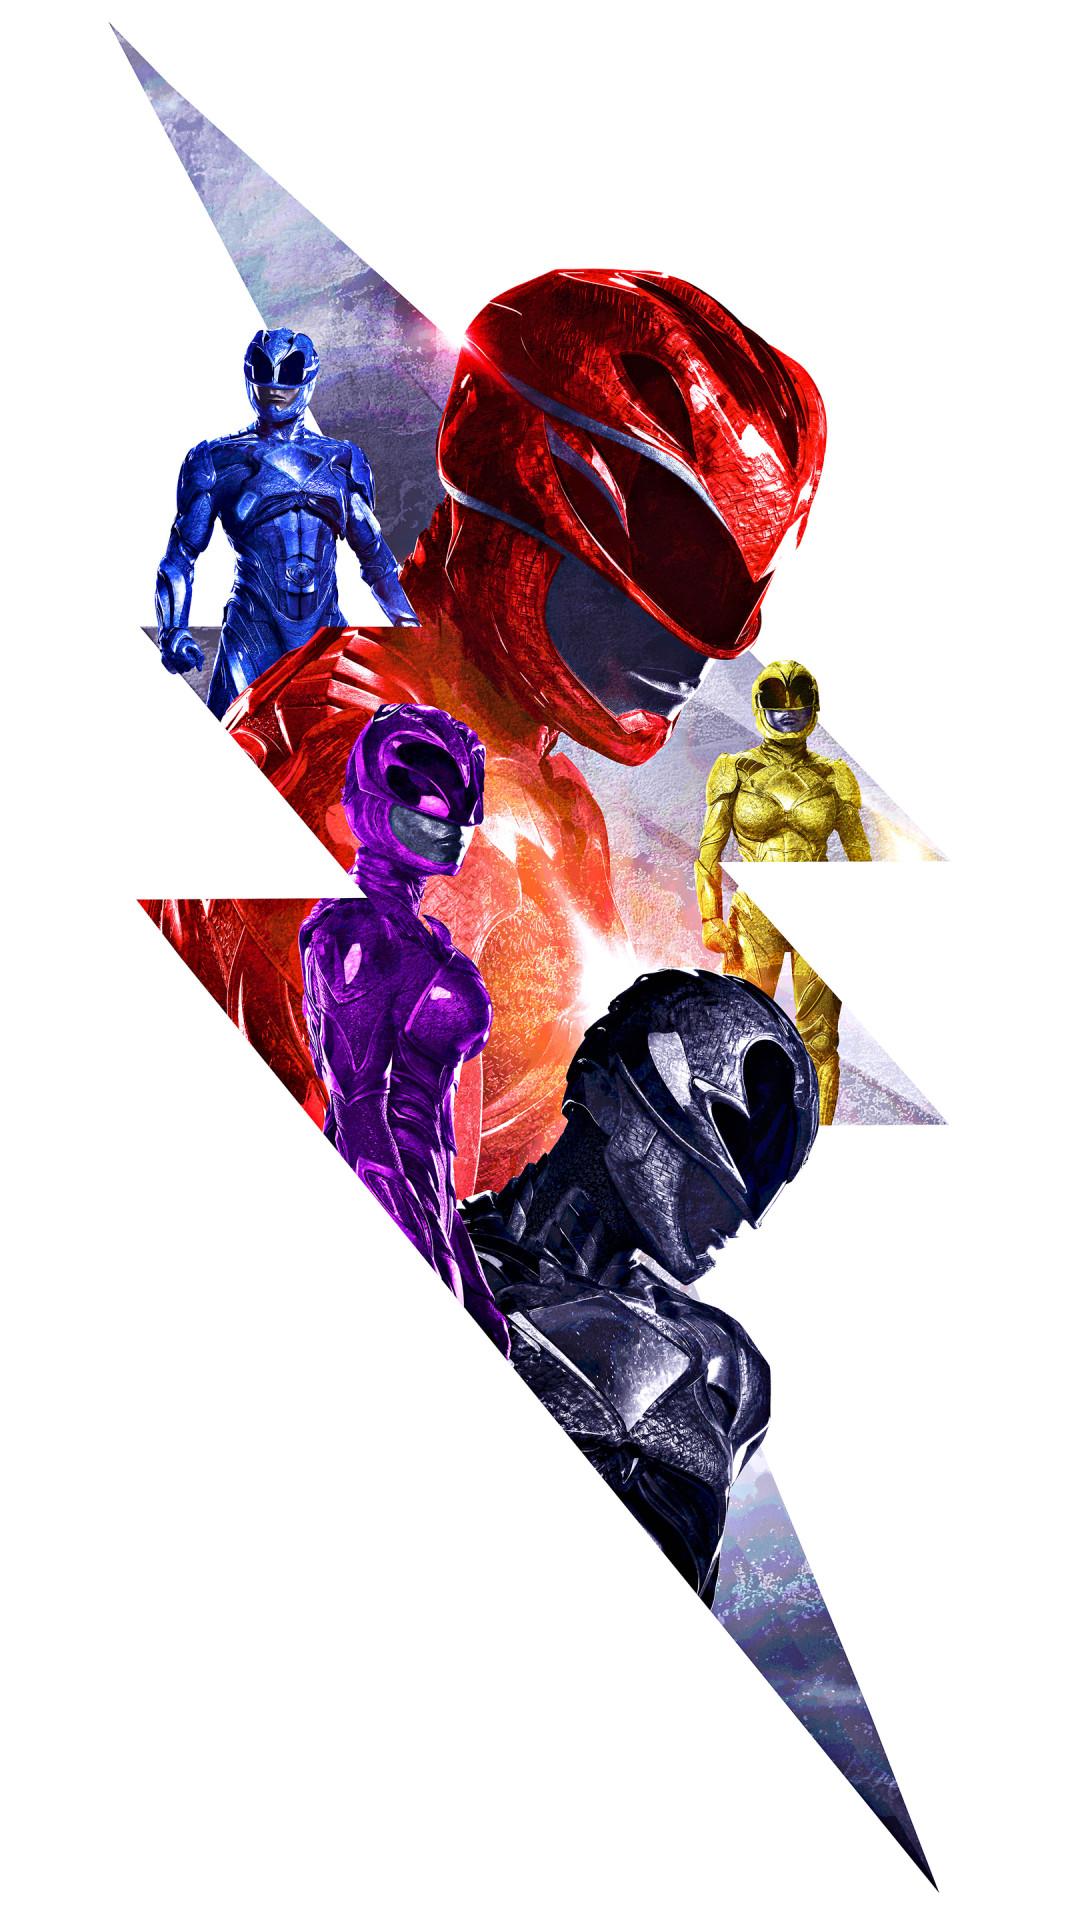 Res: 1080x1920, Movie / Power Rangers (2017) () Mobile Wallpaper